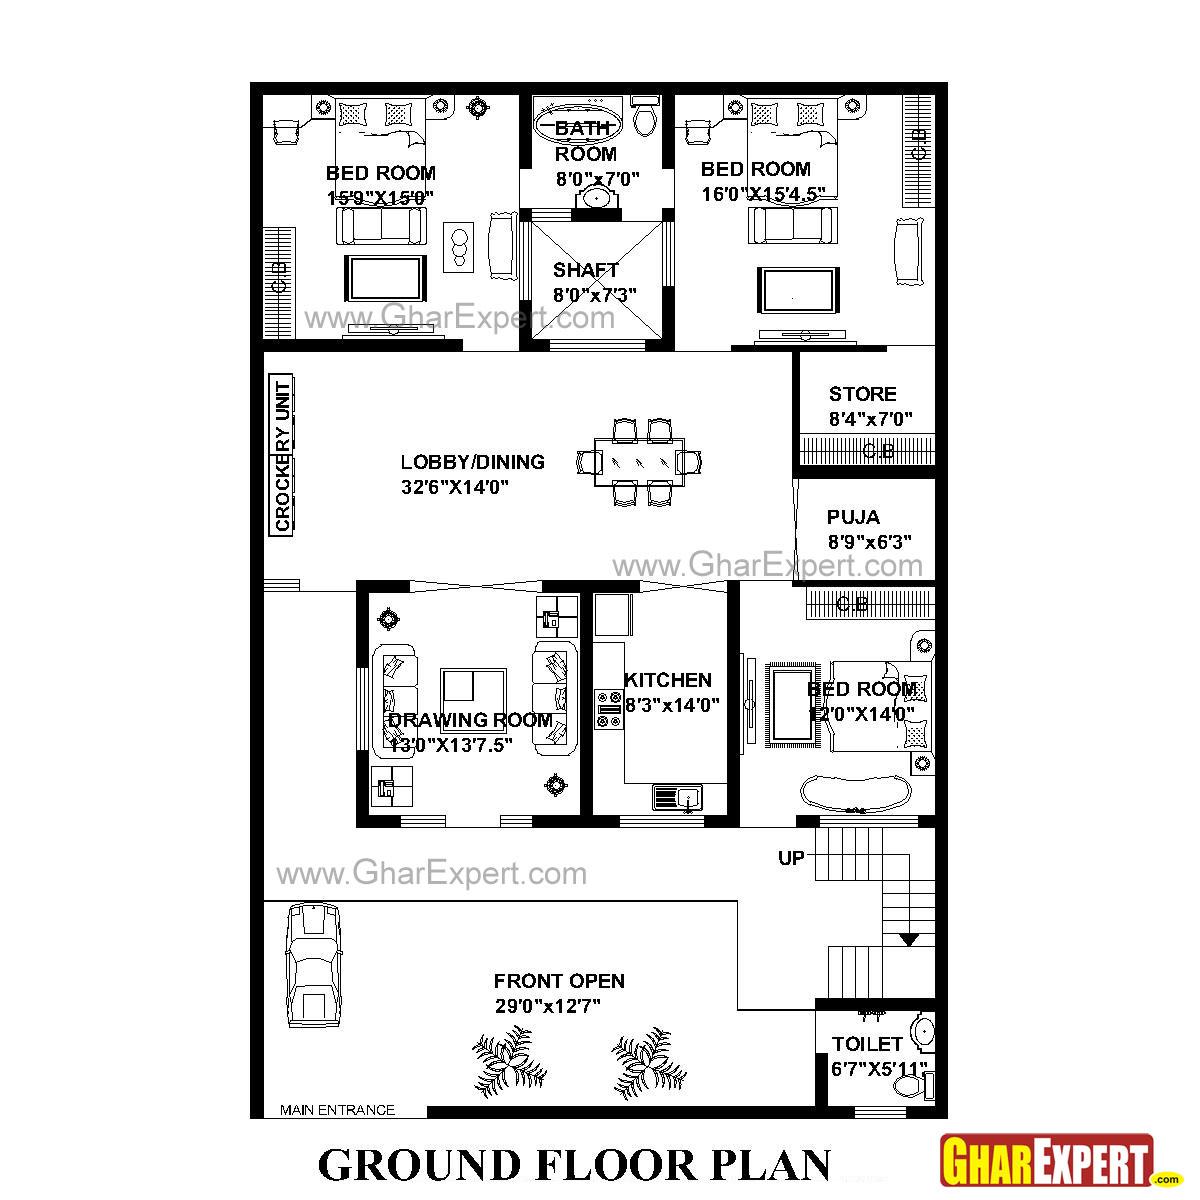 House Plan for 43 Feet by 64 Feet plot (Plot Size 306